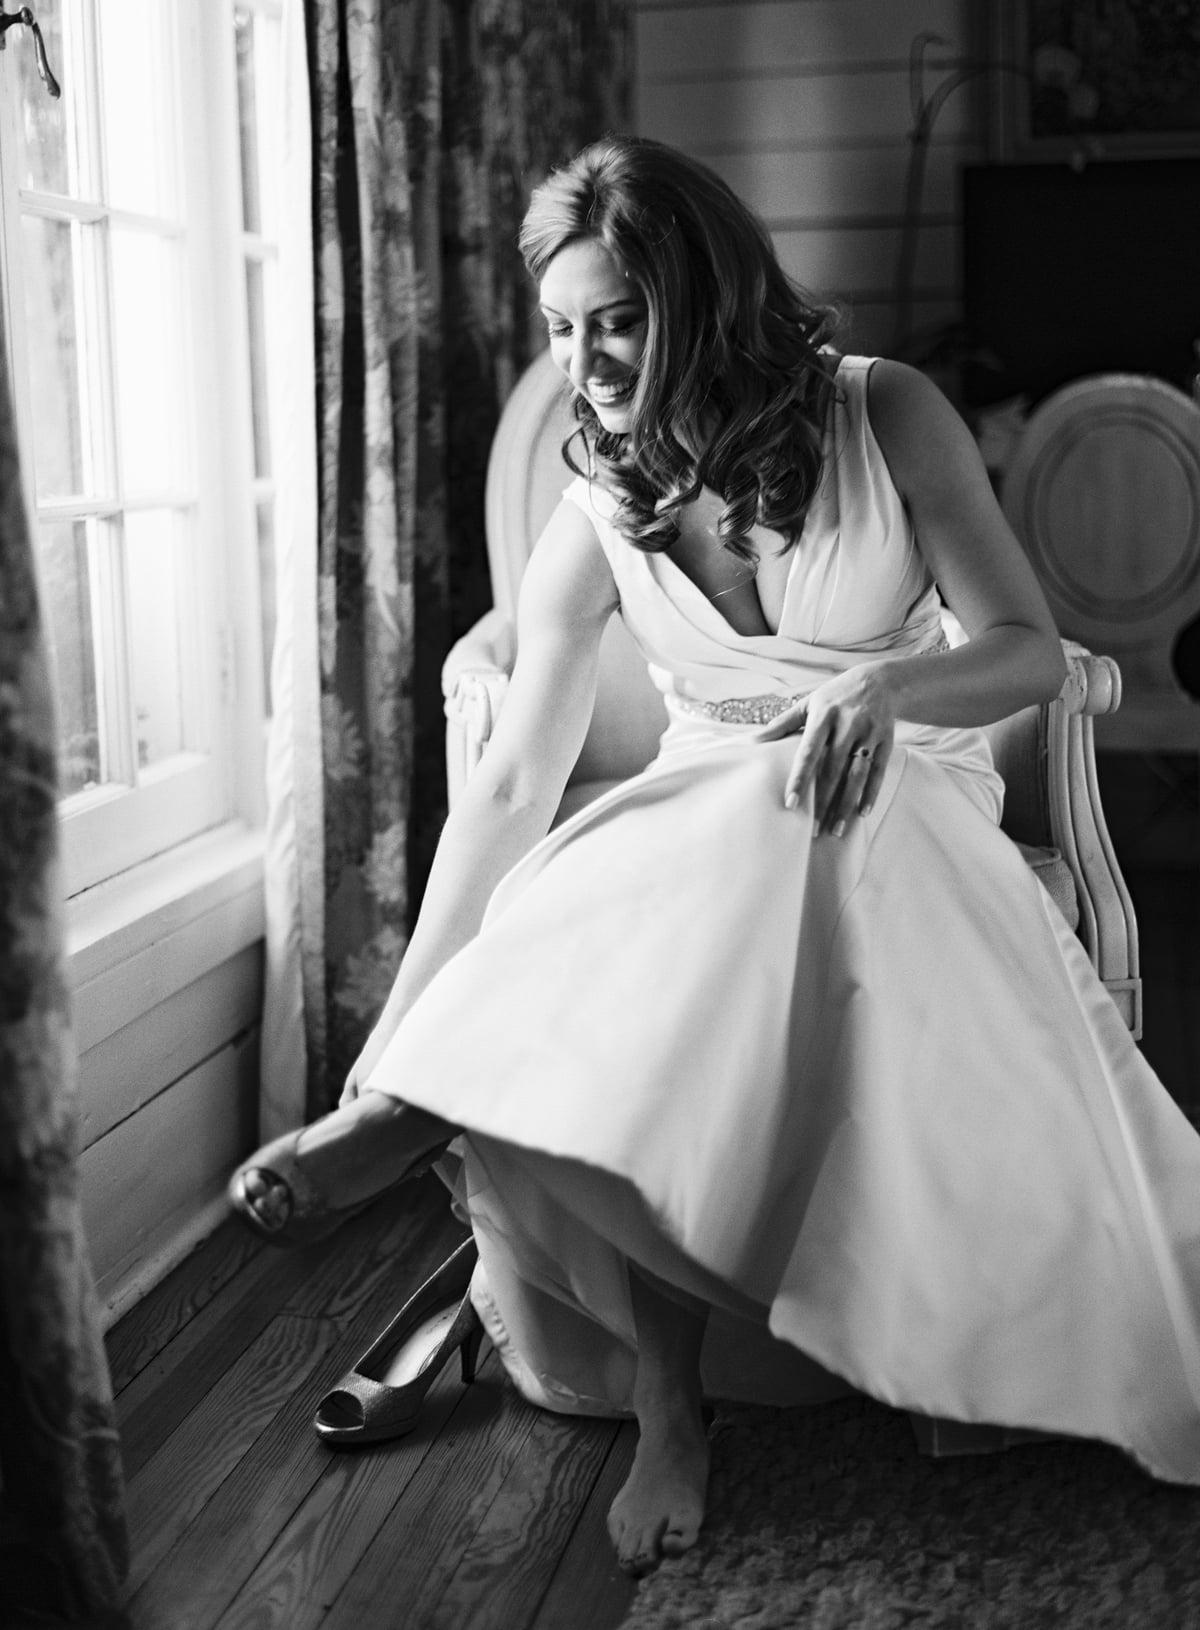 clifton-inn-wedding-014.jpg